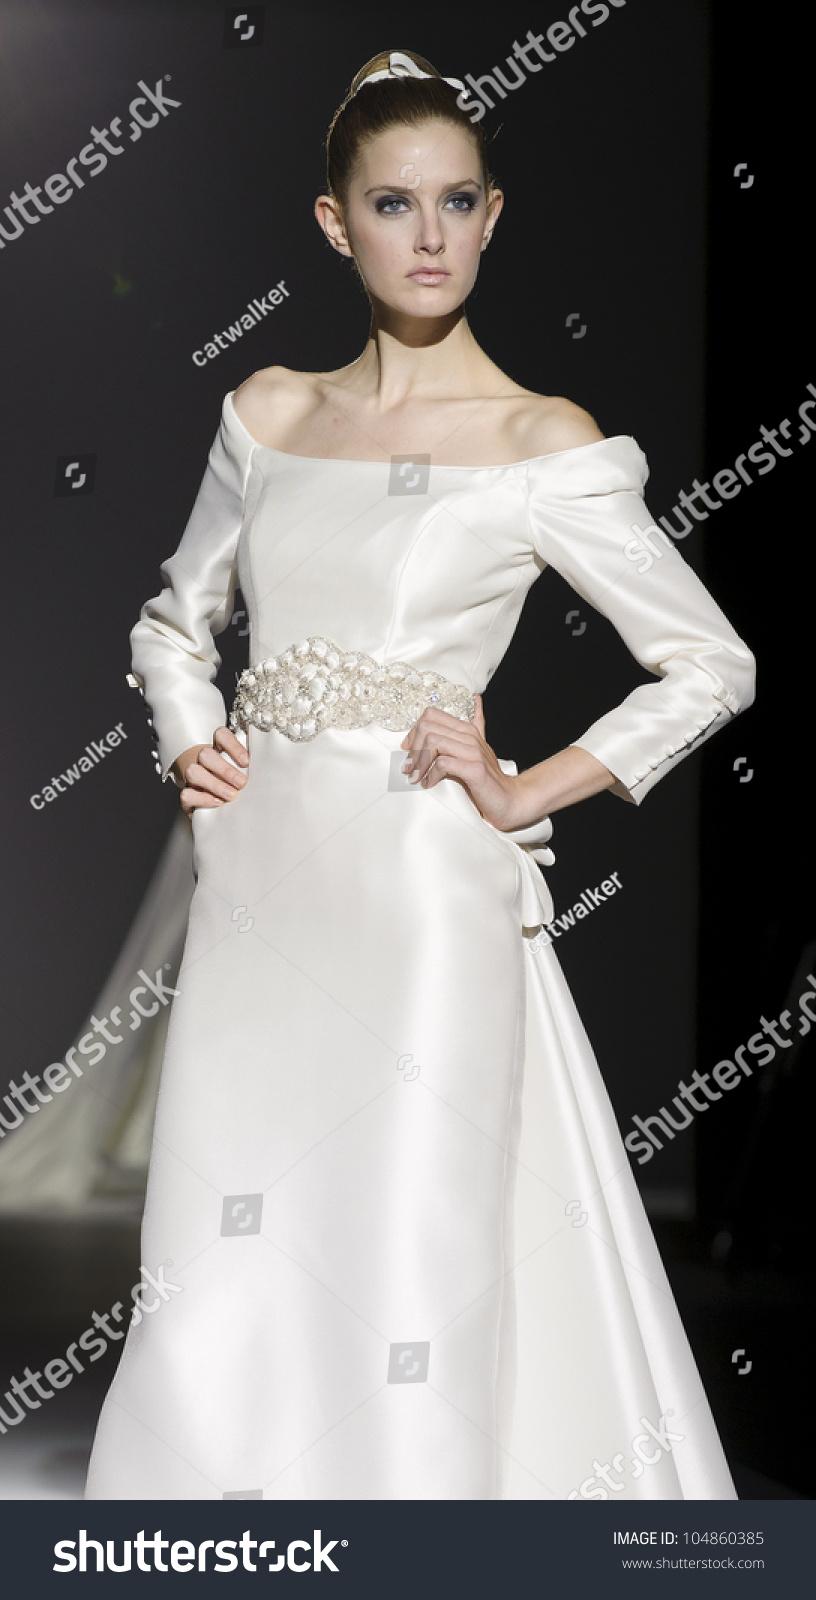 Project Runway Arabia >> Barcelona - May 10: A Model Walks On The Franc Sarabia Catwalk During The Barcelona Bridal Week ...